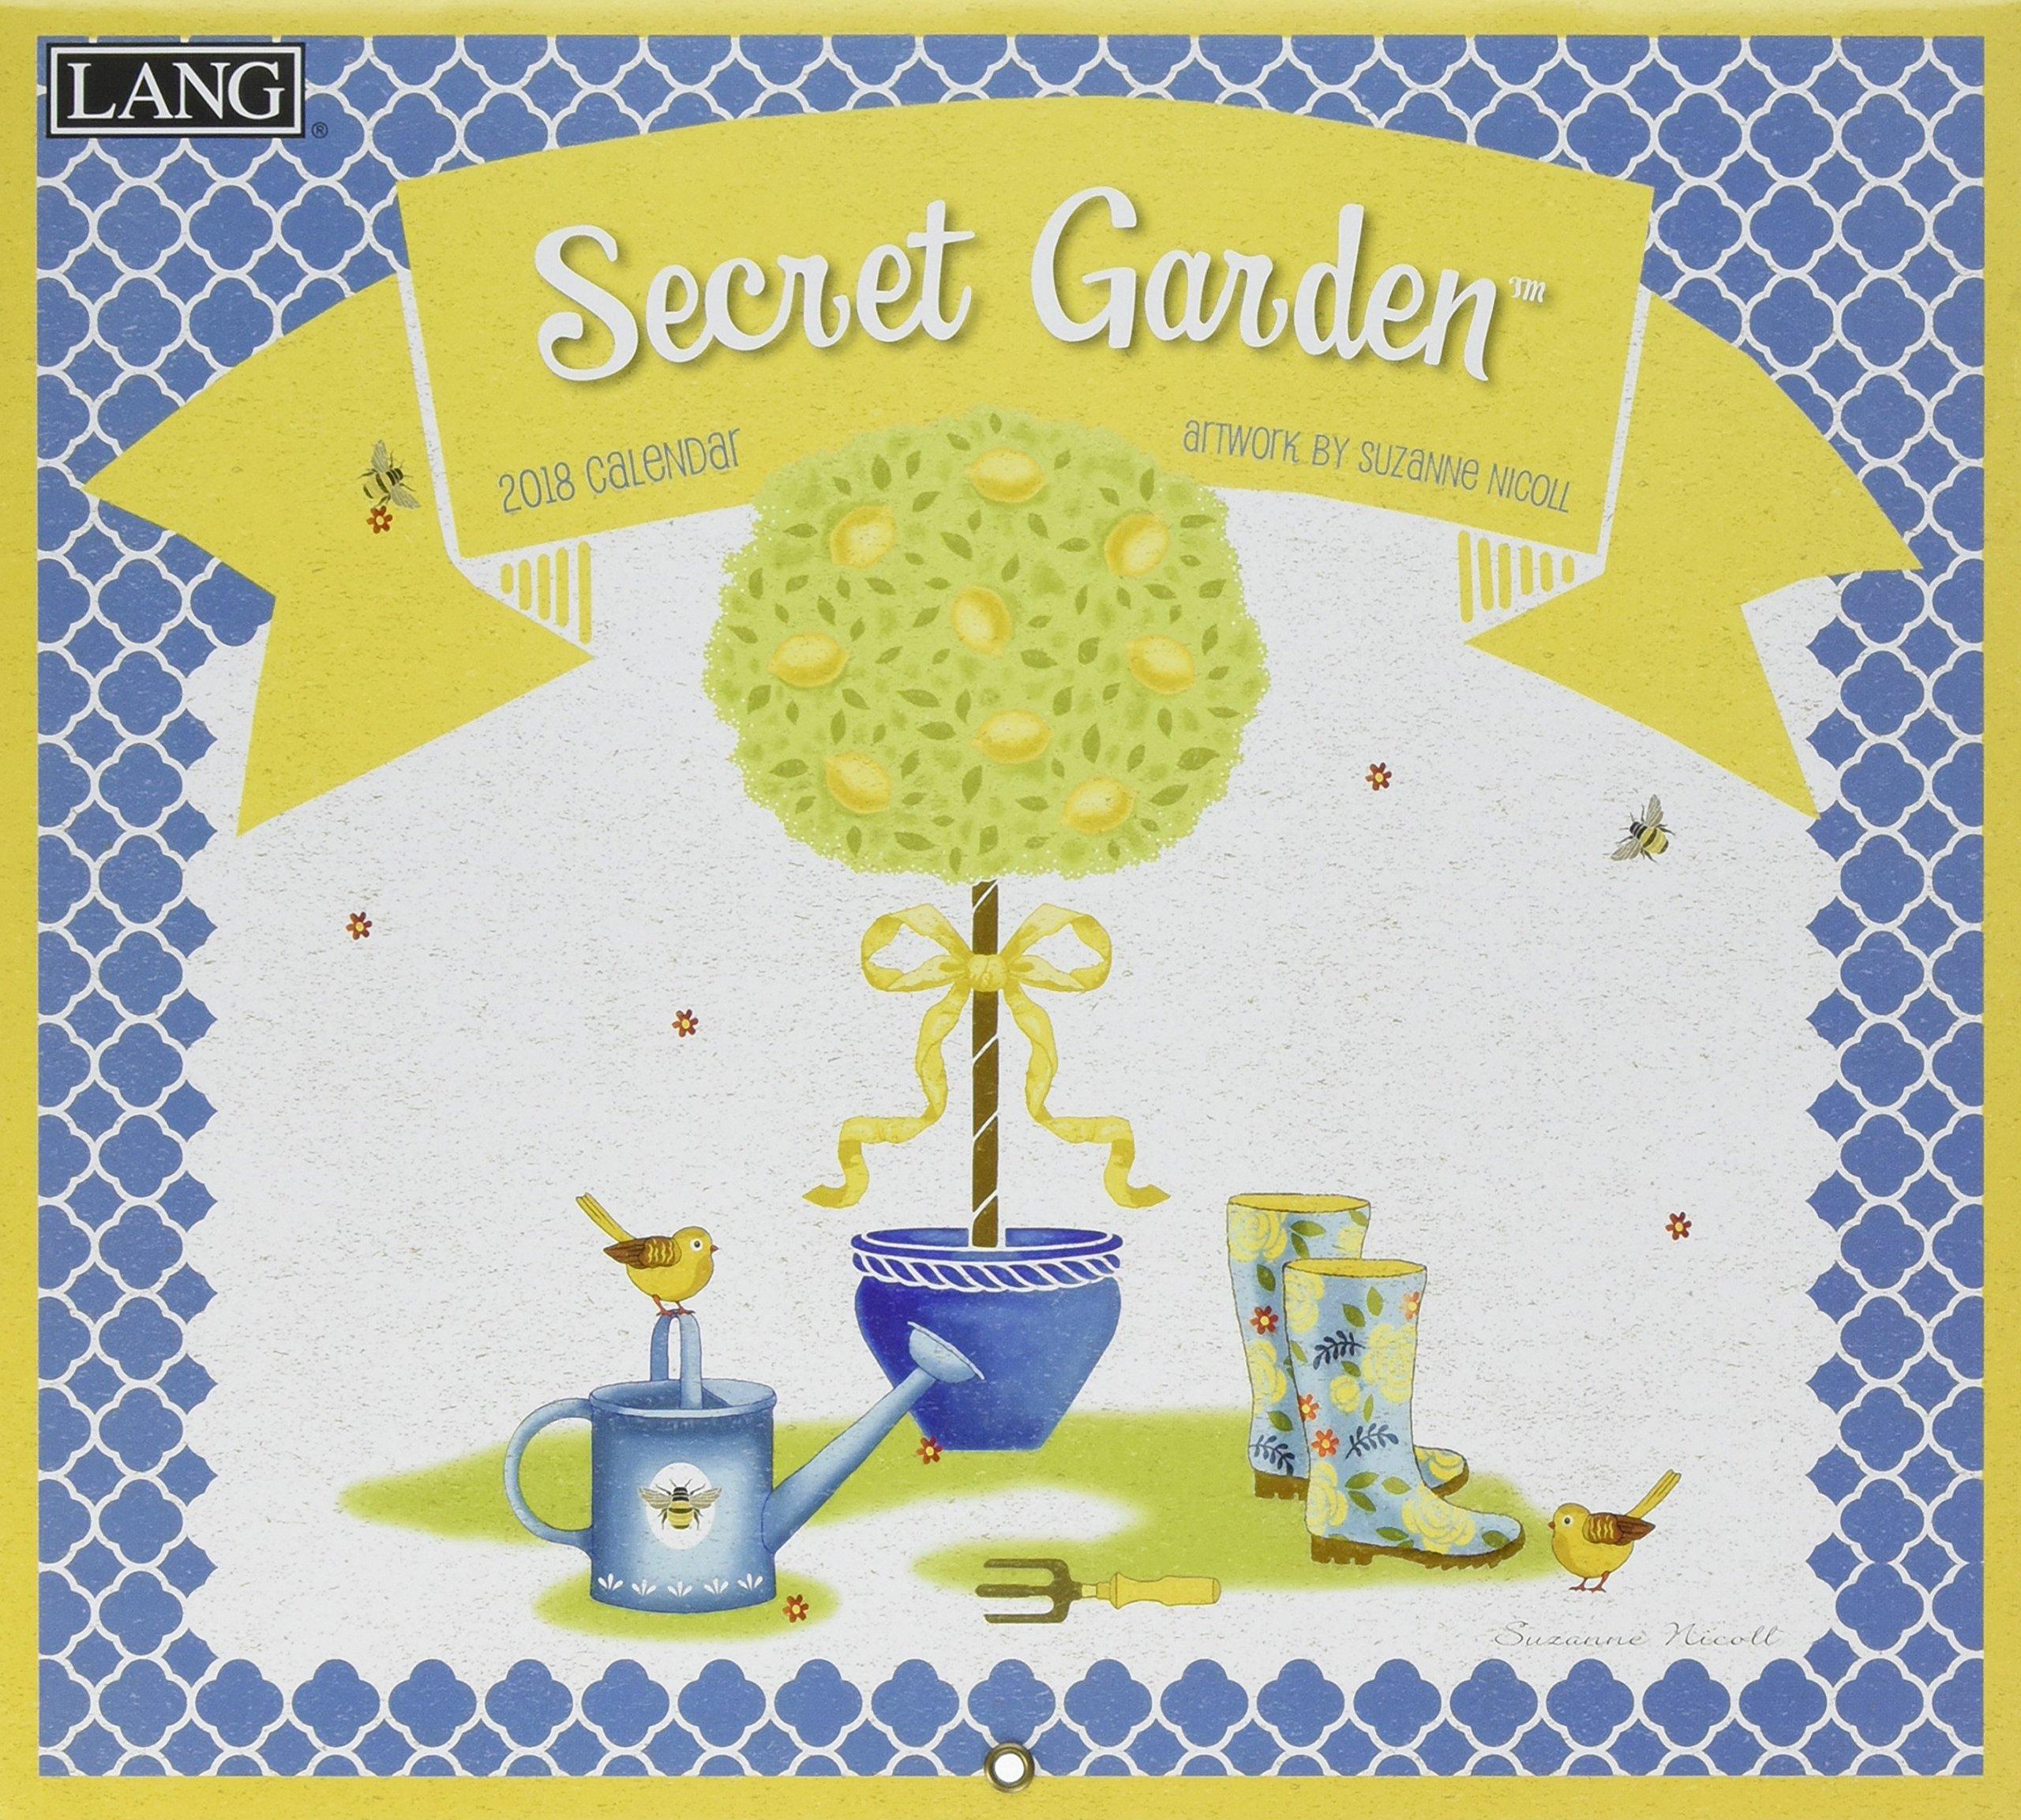 Secret Garden 2018 Calendar: Includes Downloadable Wallpaper